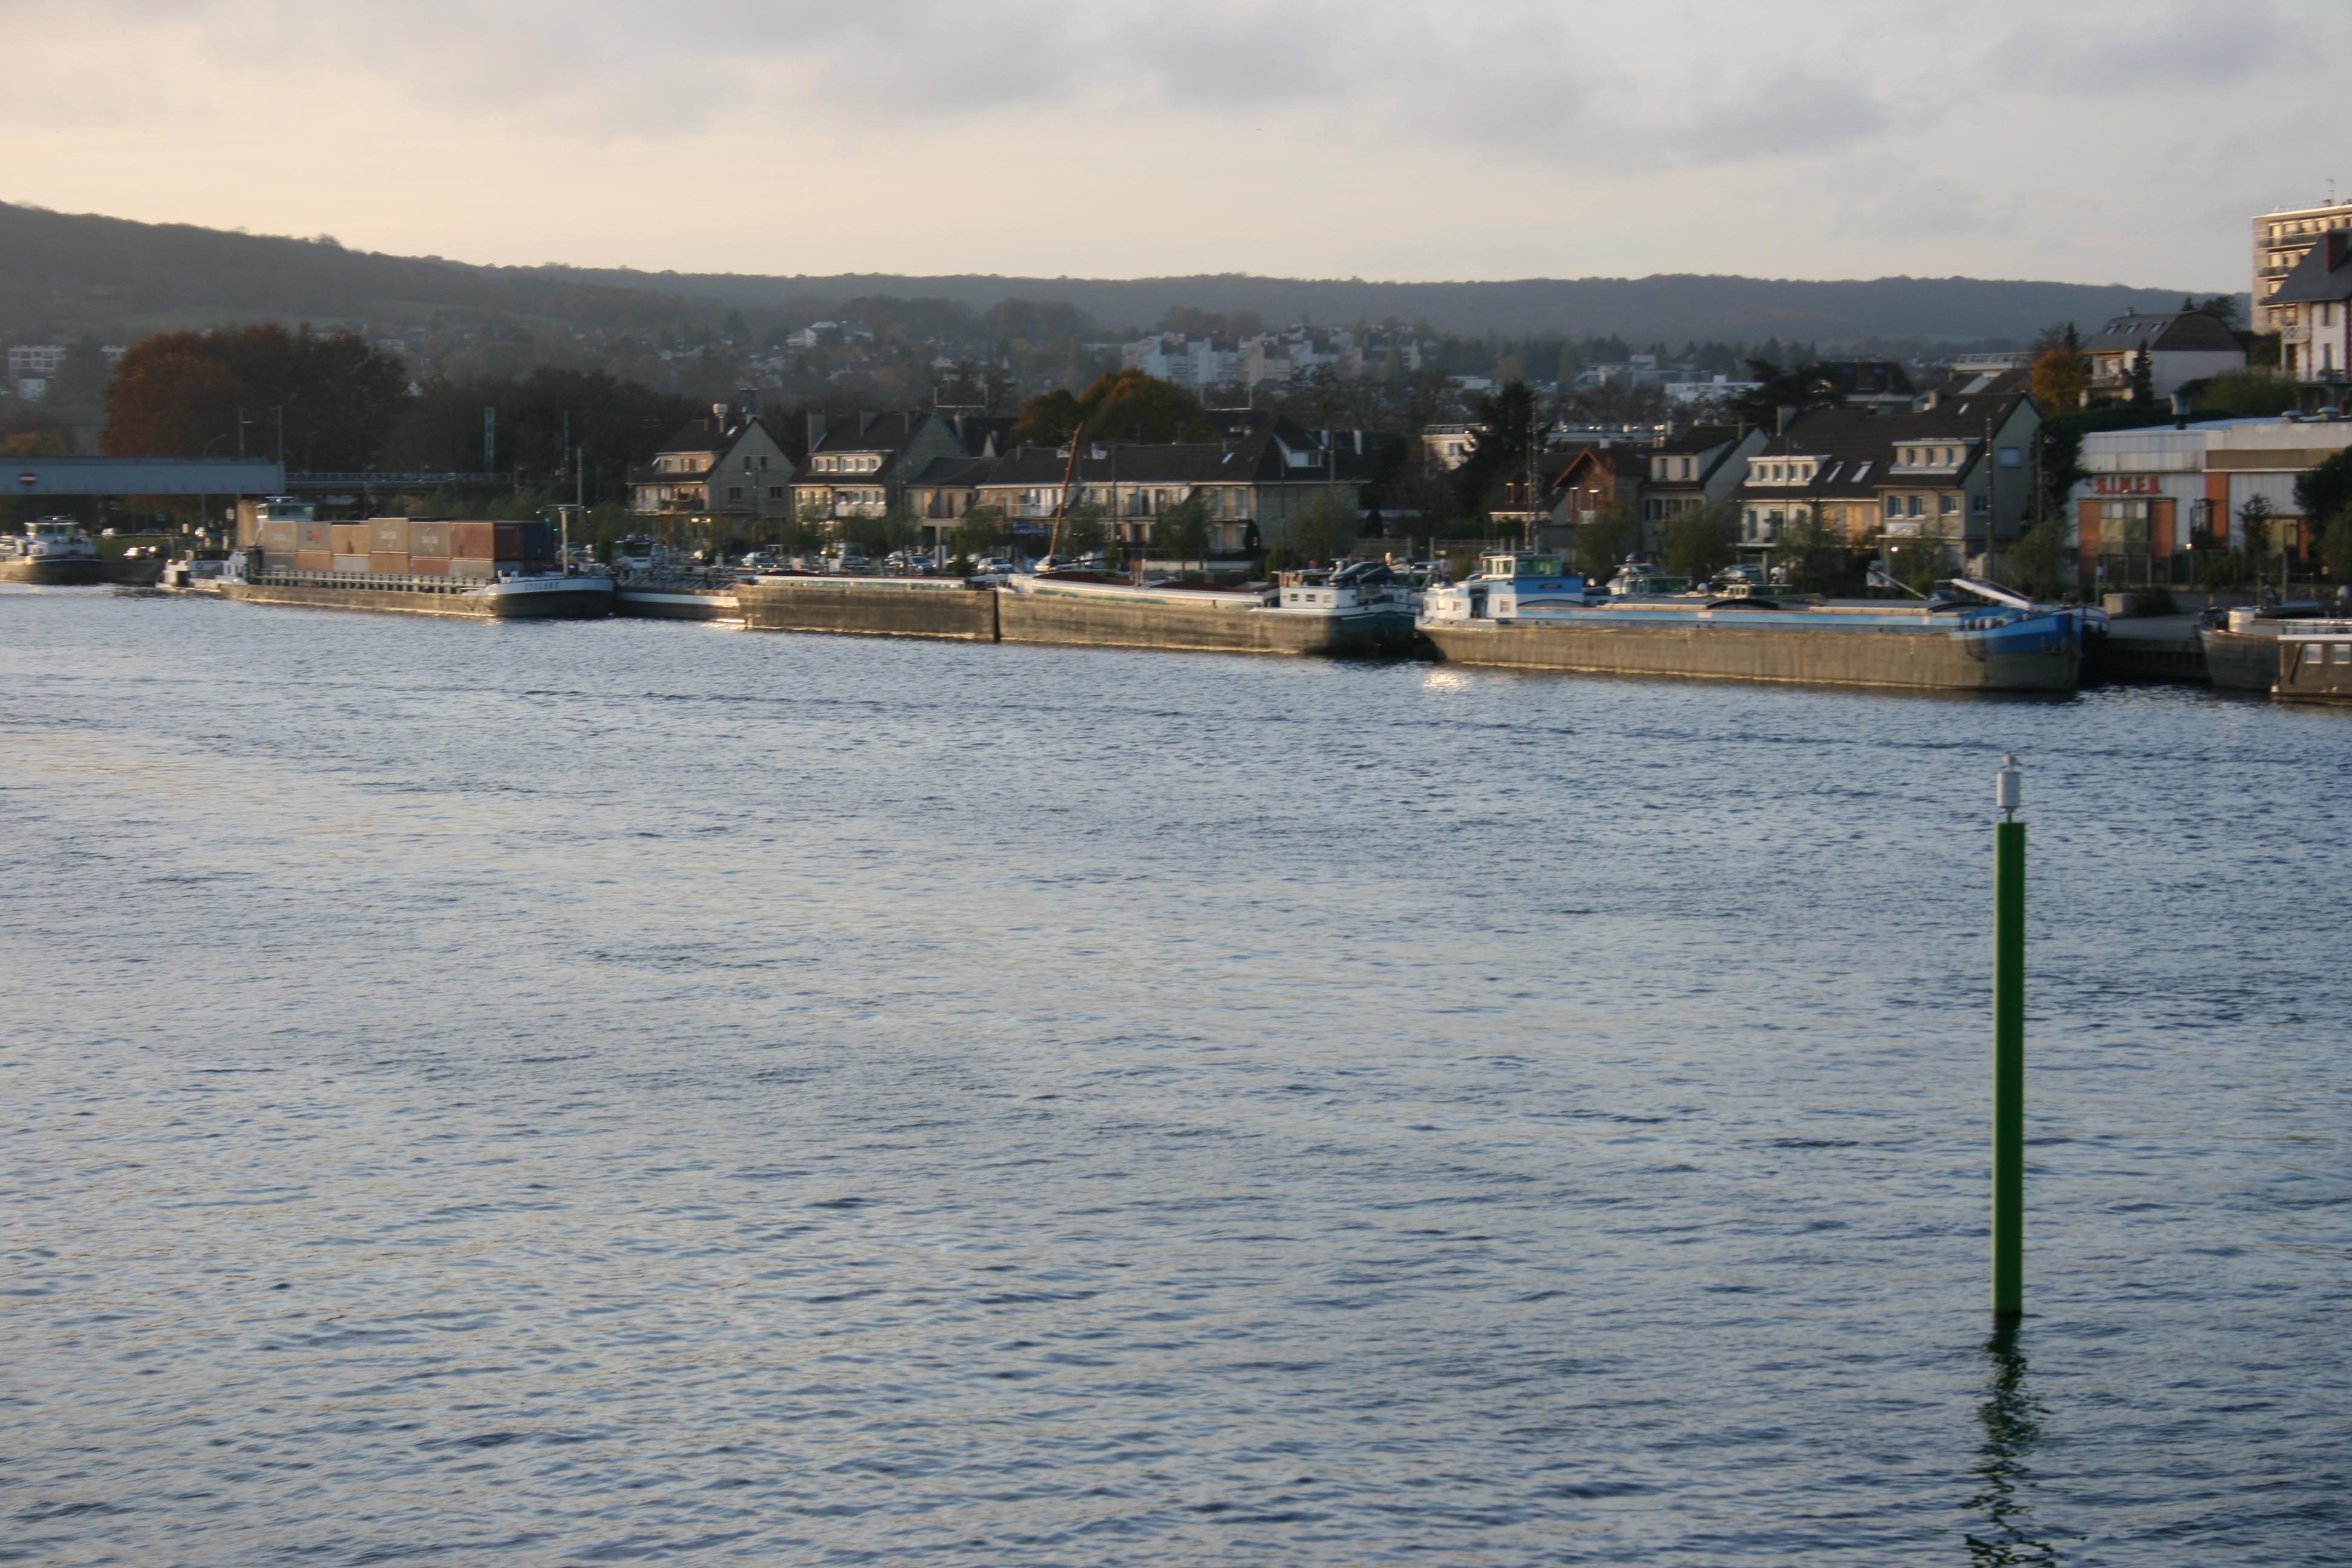 Description img 0180 boats of the seine river